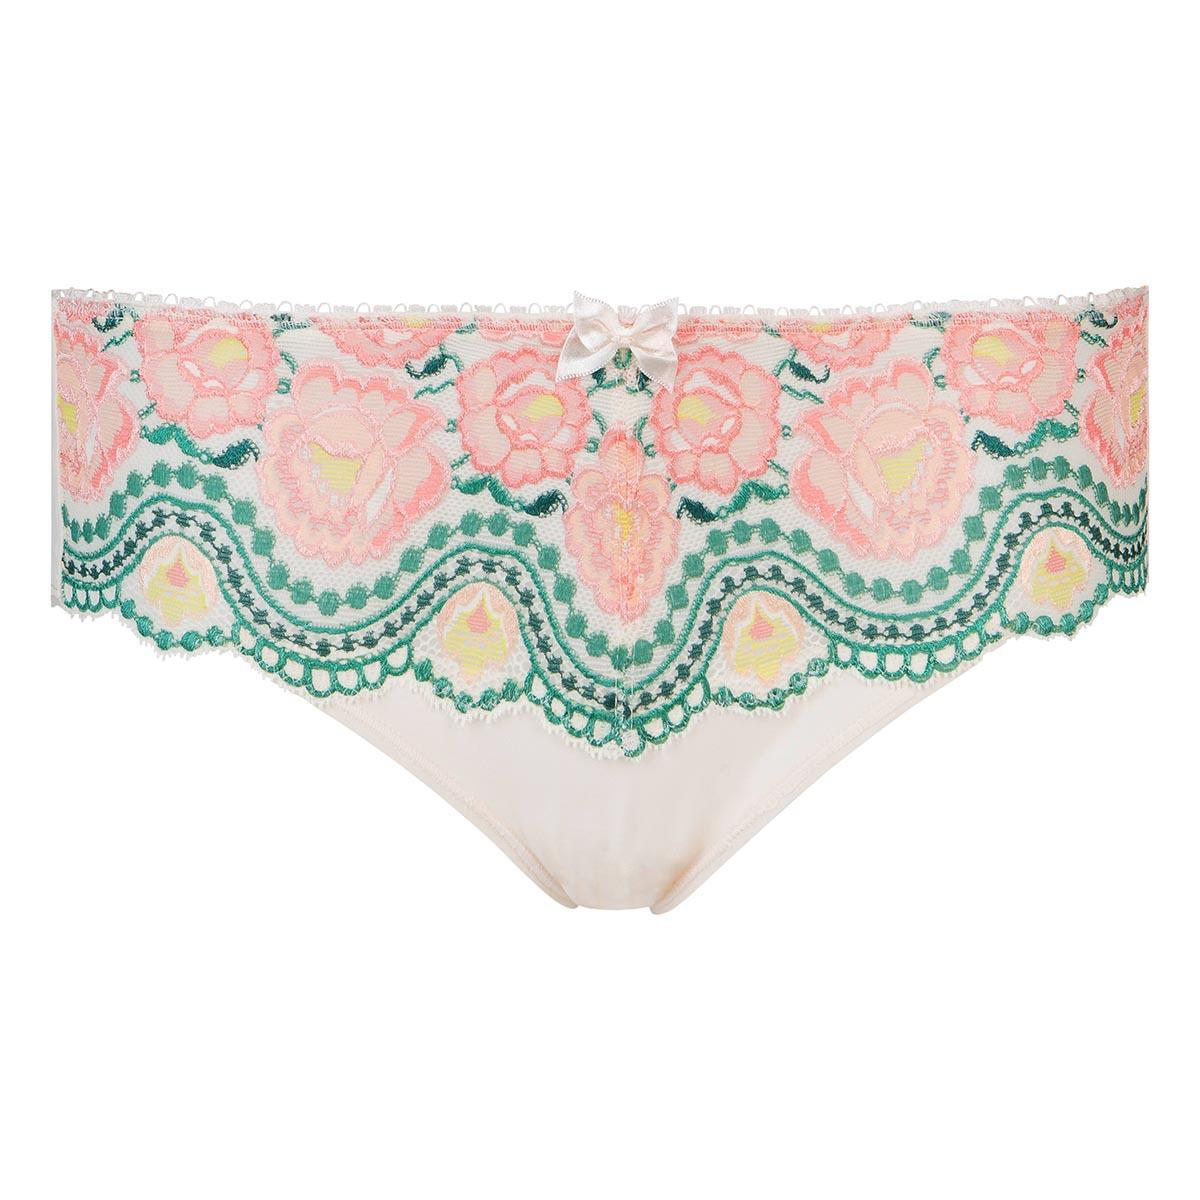 Culotte midi motif fleurs Flower Elegance, , PLAYTEX